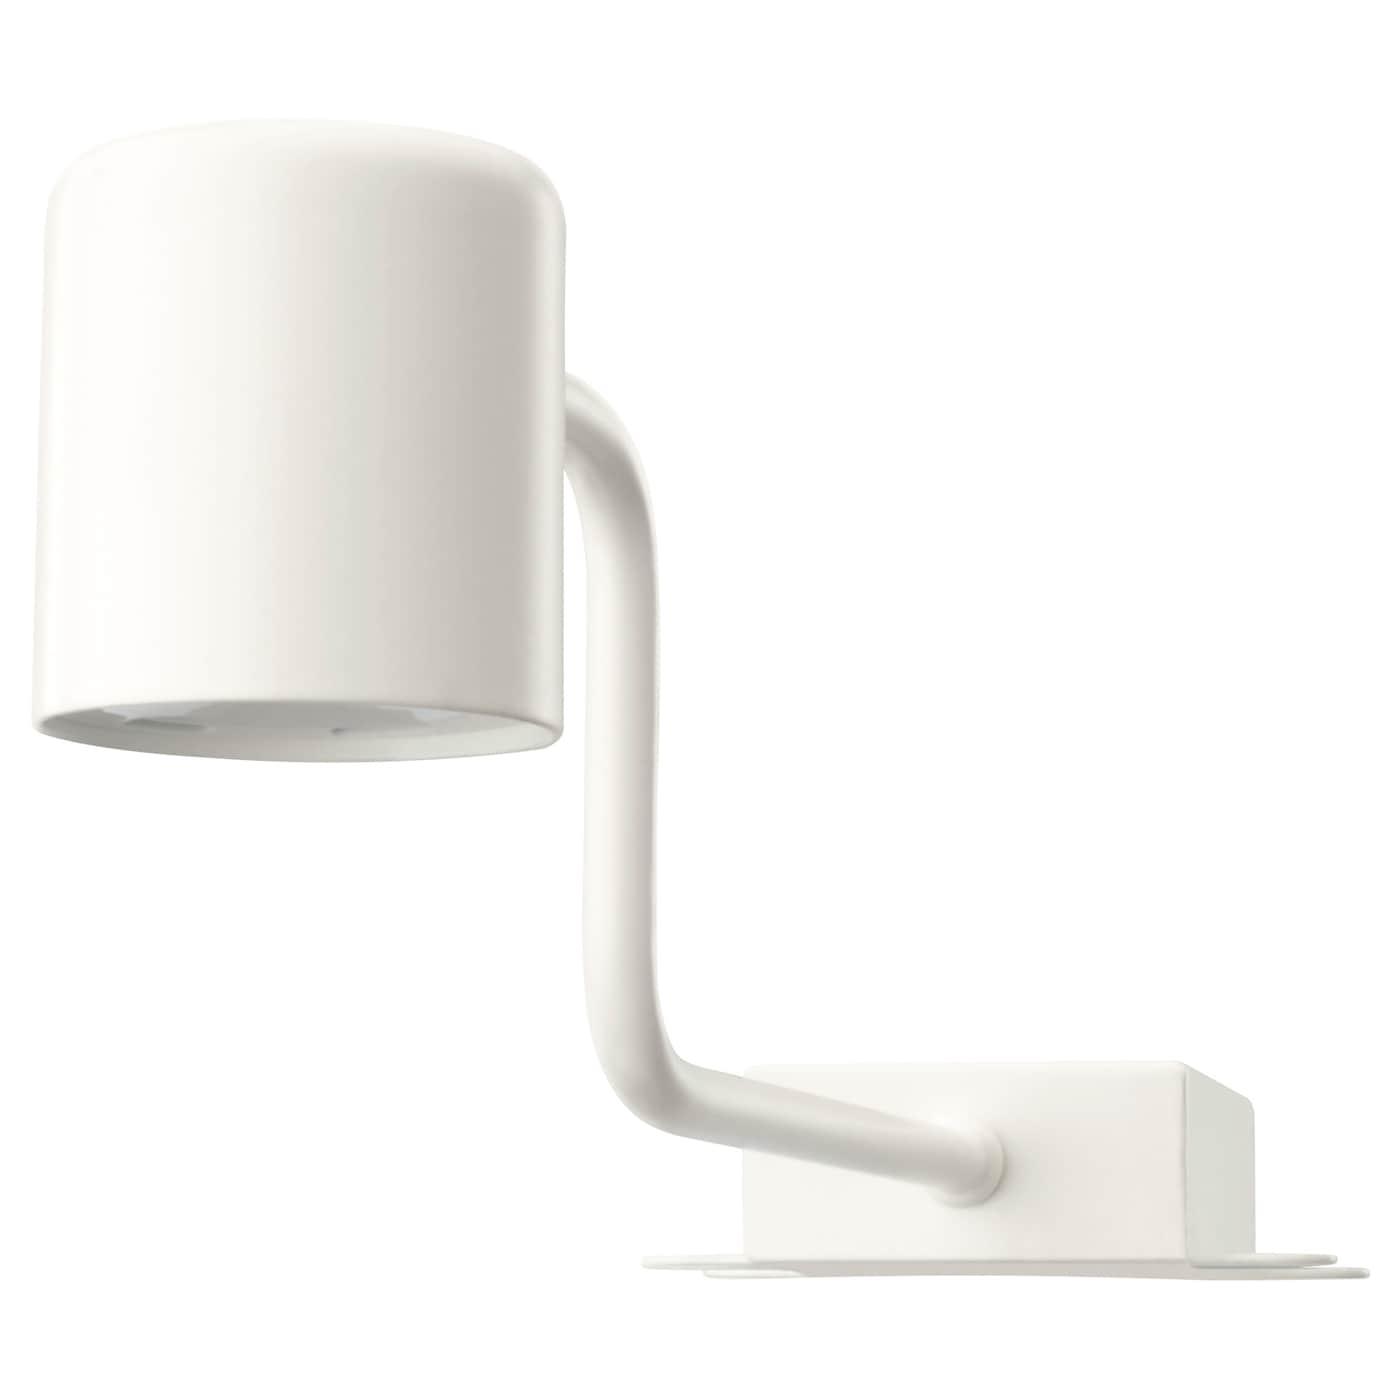 bnib ikea oleby wardrobe drawer. Ikea Oleby Wardrobe Lighting. IKEA URSHULT LED Cabinet Lighting Provides A Focused Light That Is Bnib Drawer L